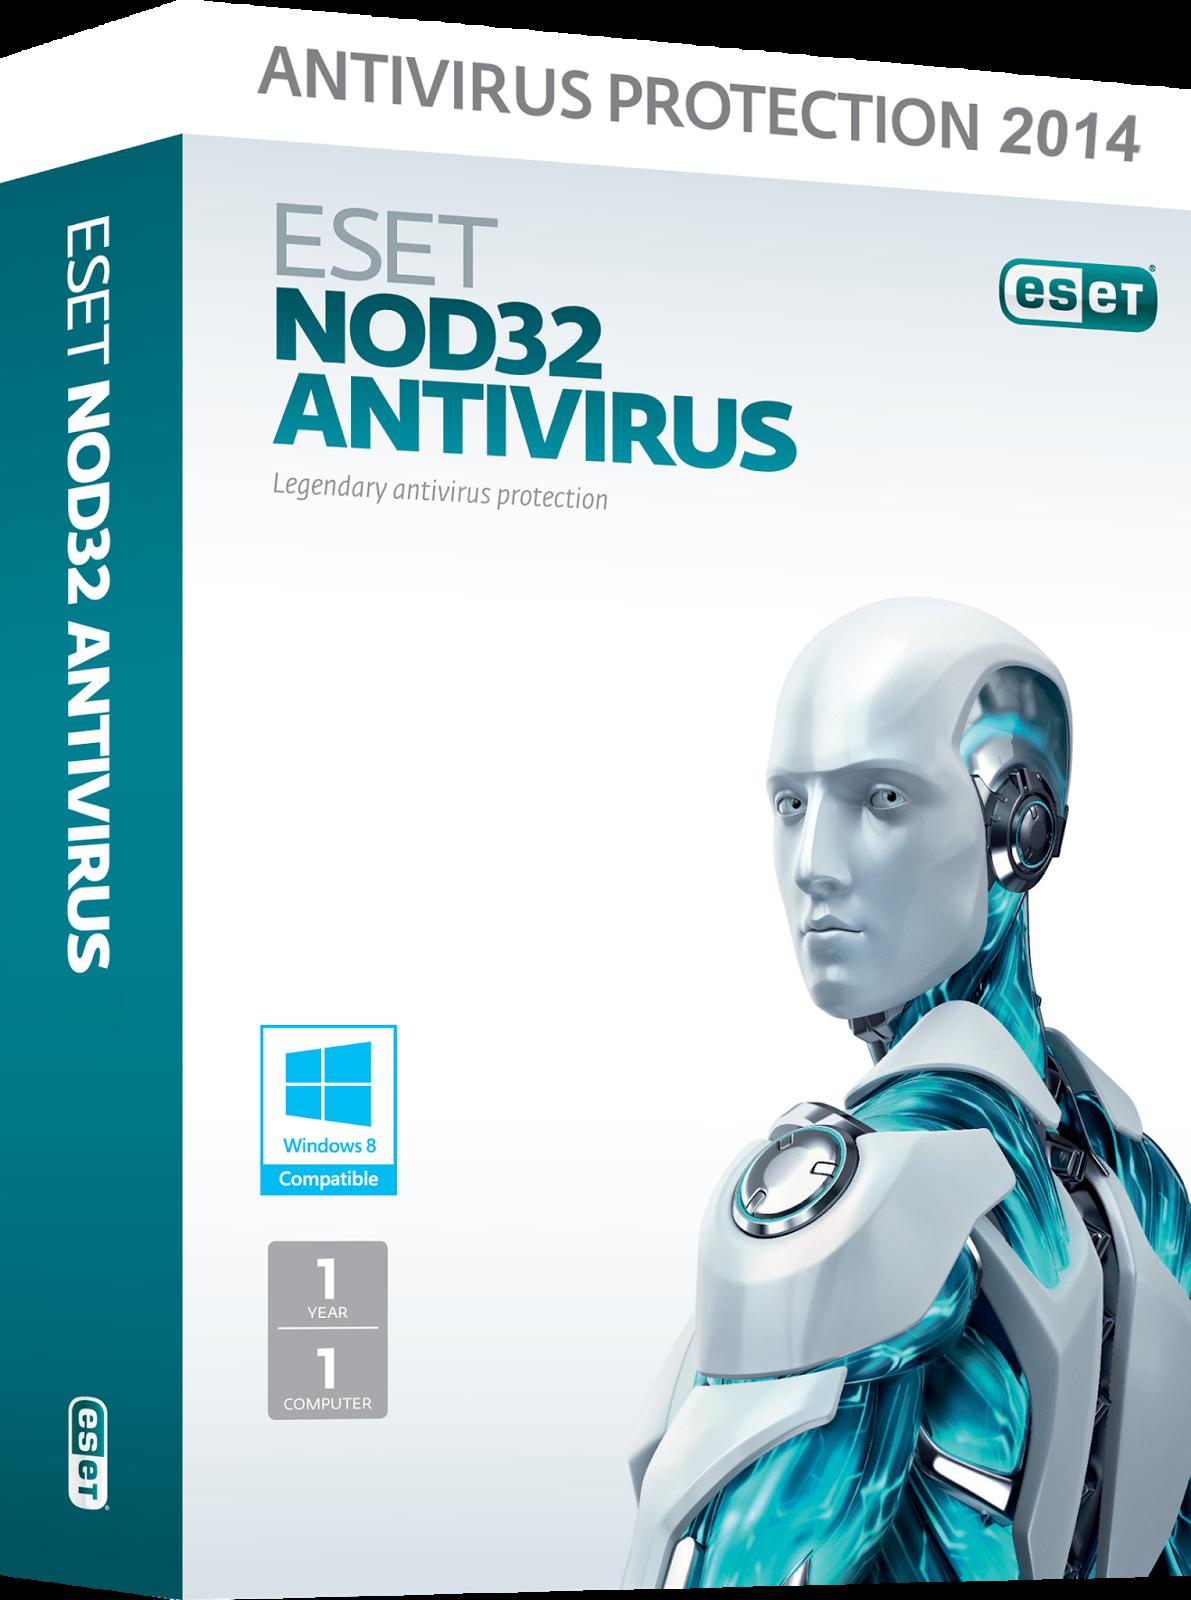 eset nod32 antivirus 9 username and password